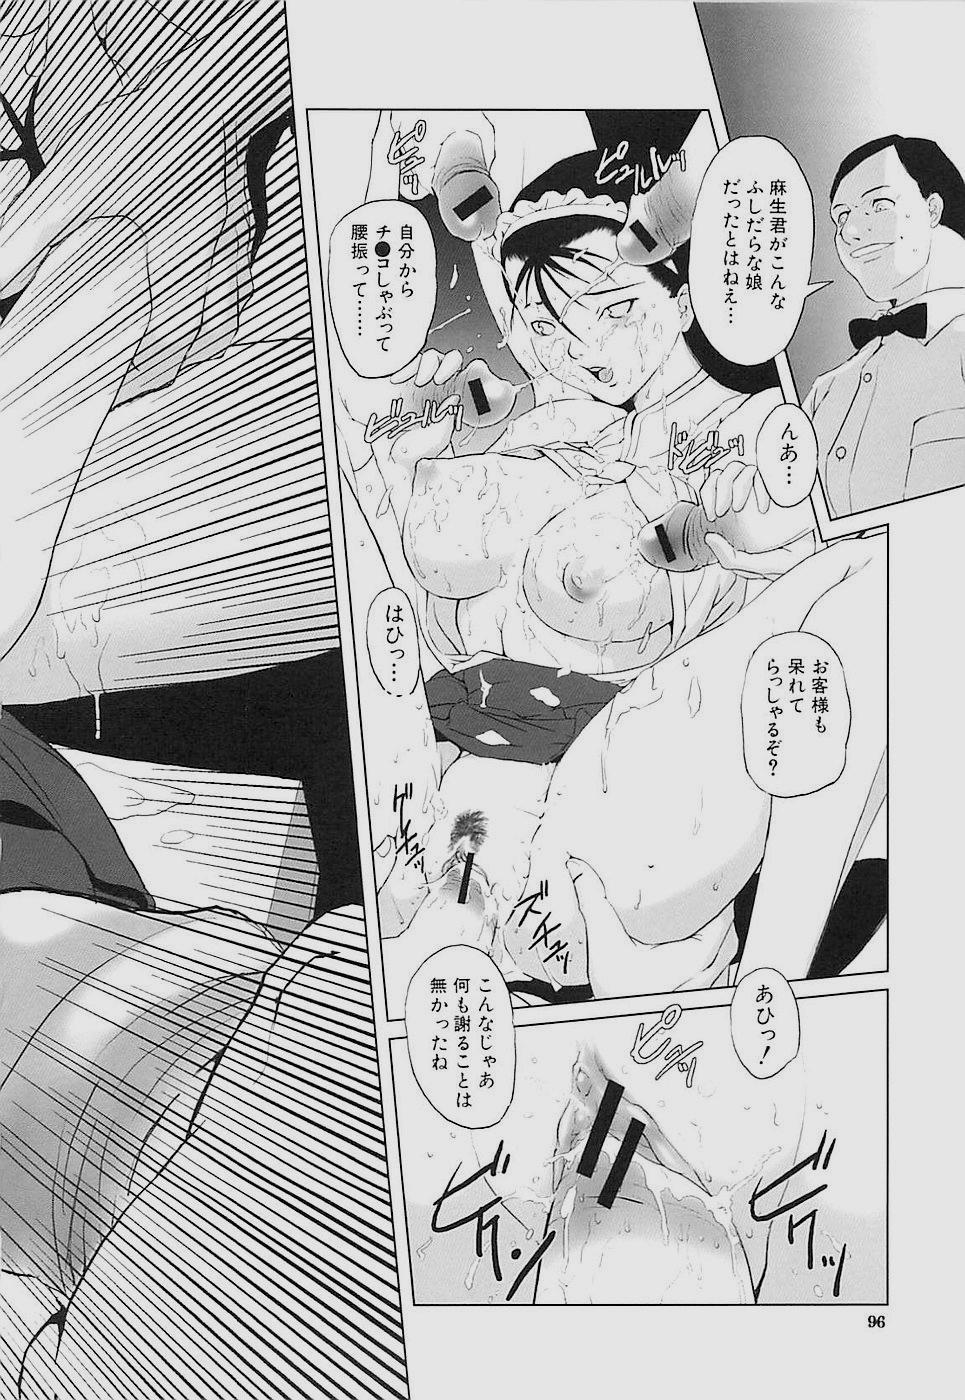 Inkoukamitsu 96